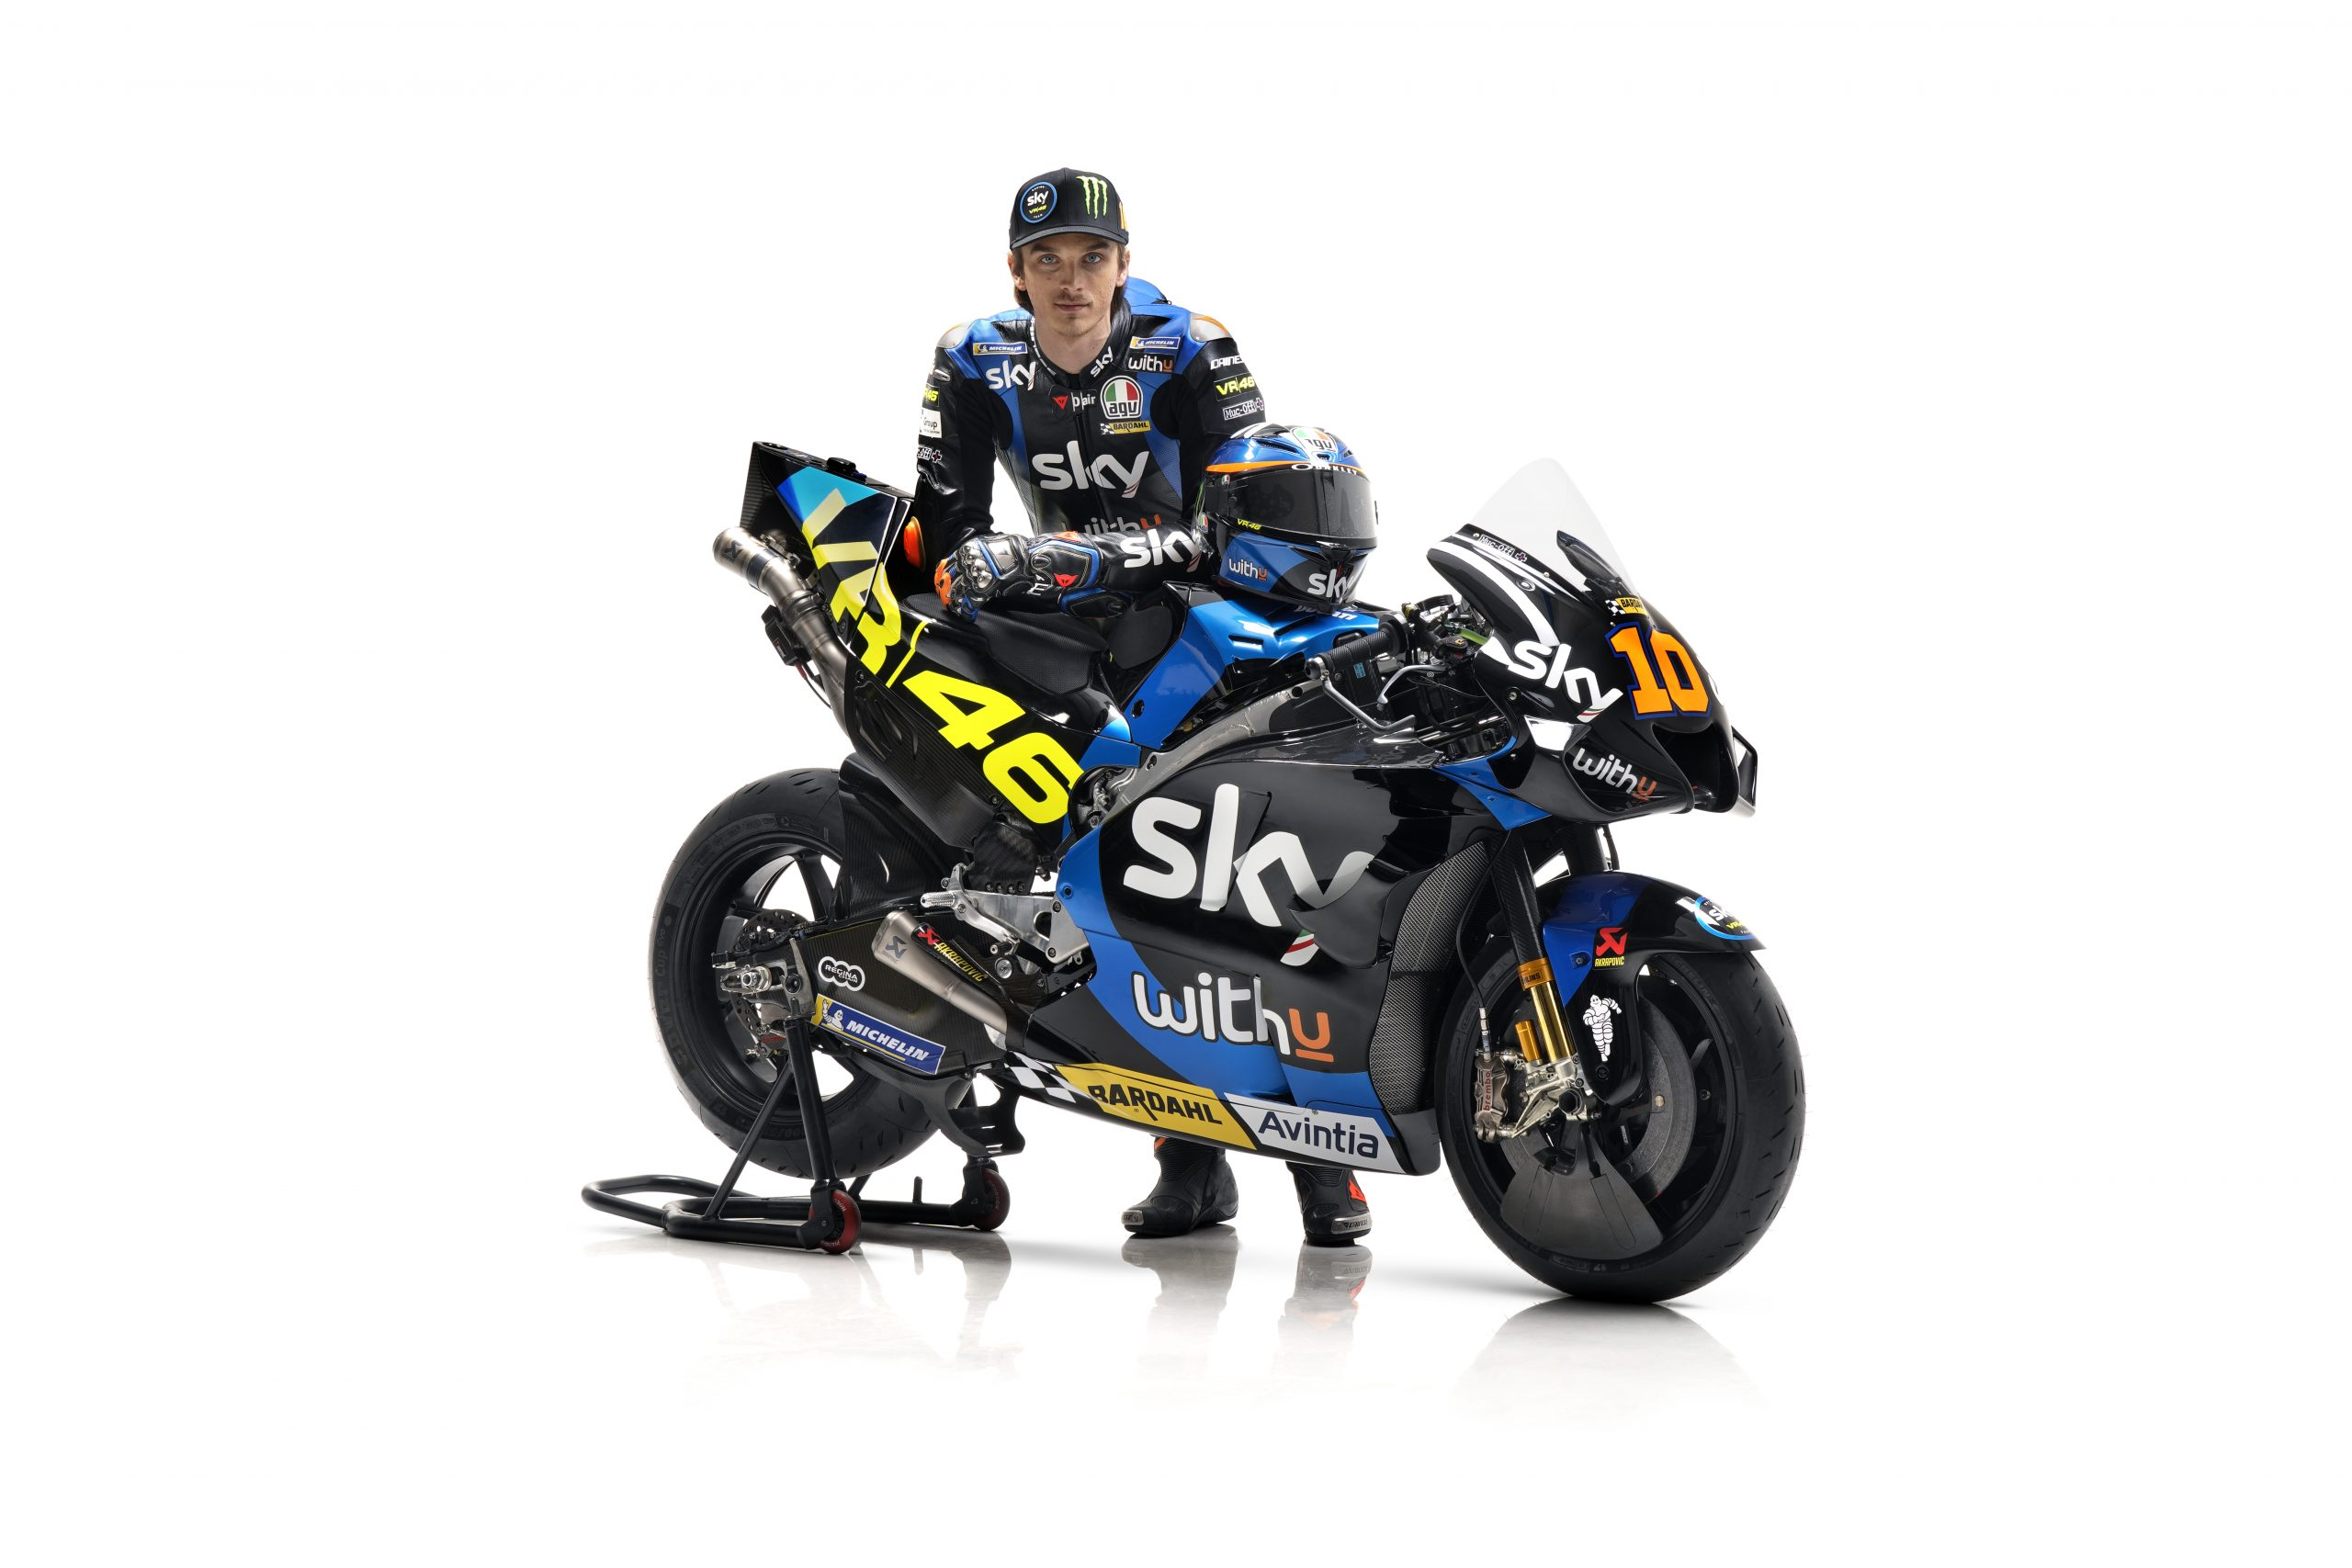 Luca Marini zadebiutuje w MotoGP